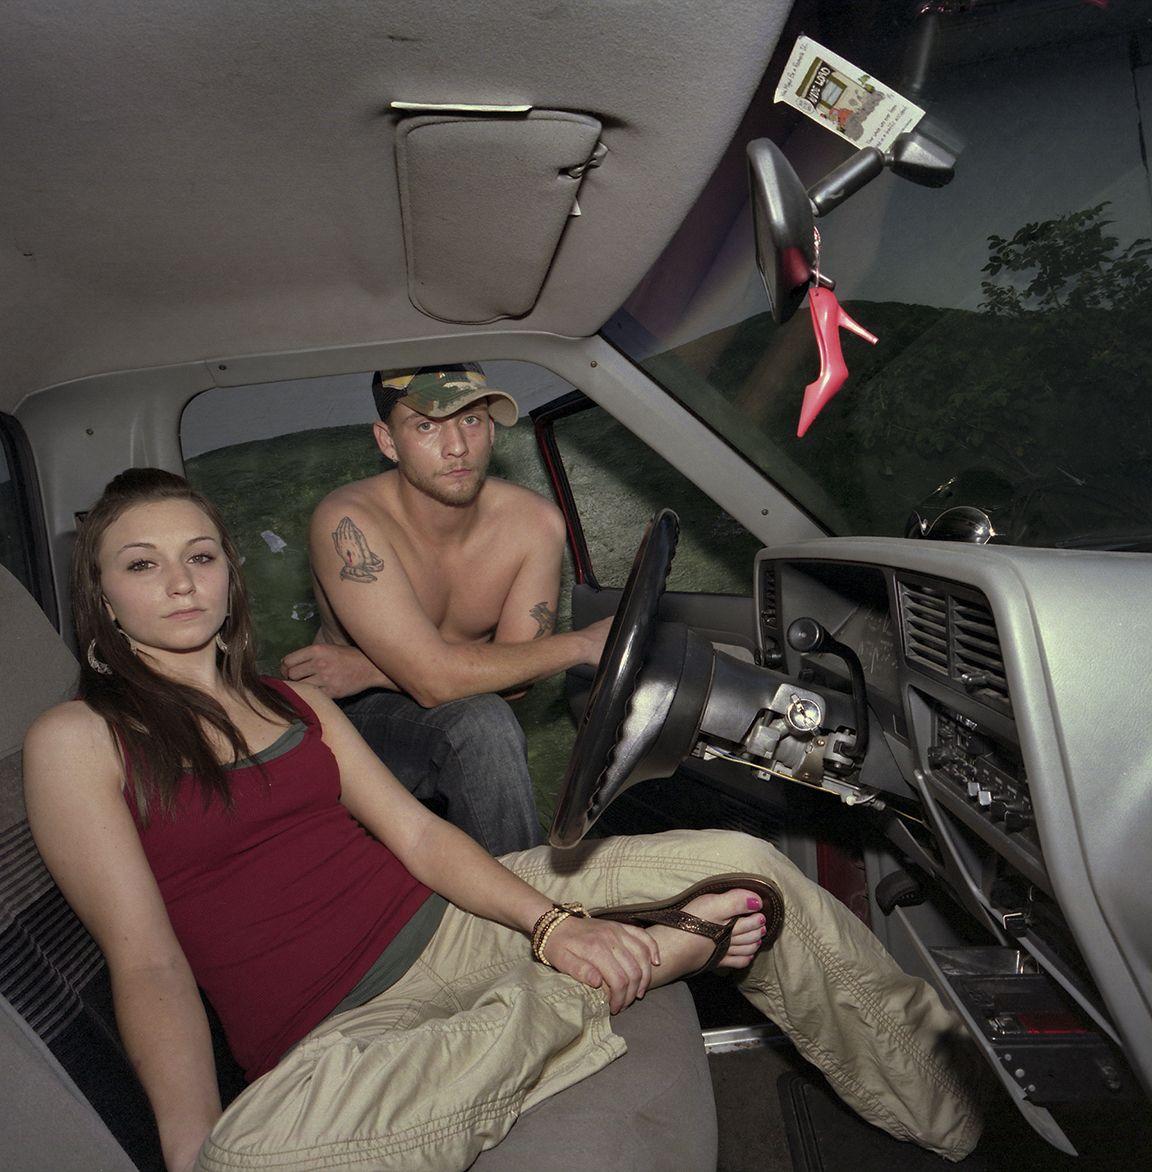 Mike Smith (1951-)  Pleasant Beach, TN (07-086-7R), 2007  Chromogenic Print  30h x 30w in, Photography